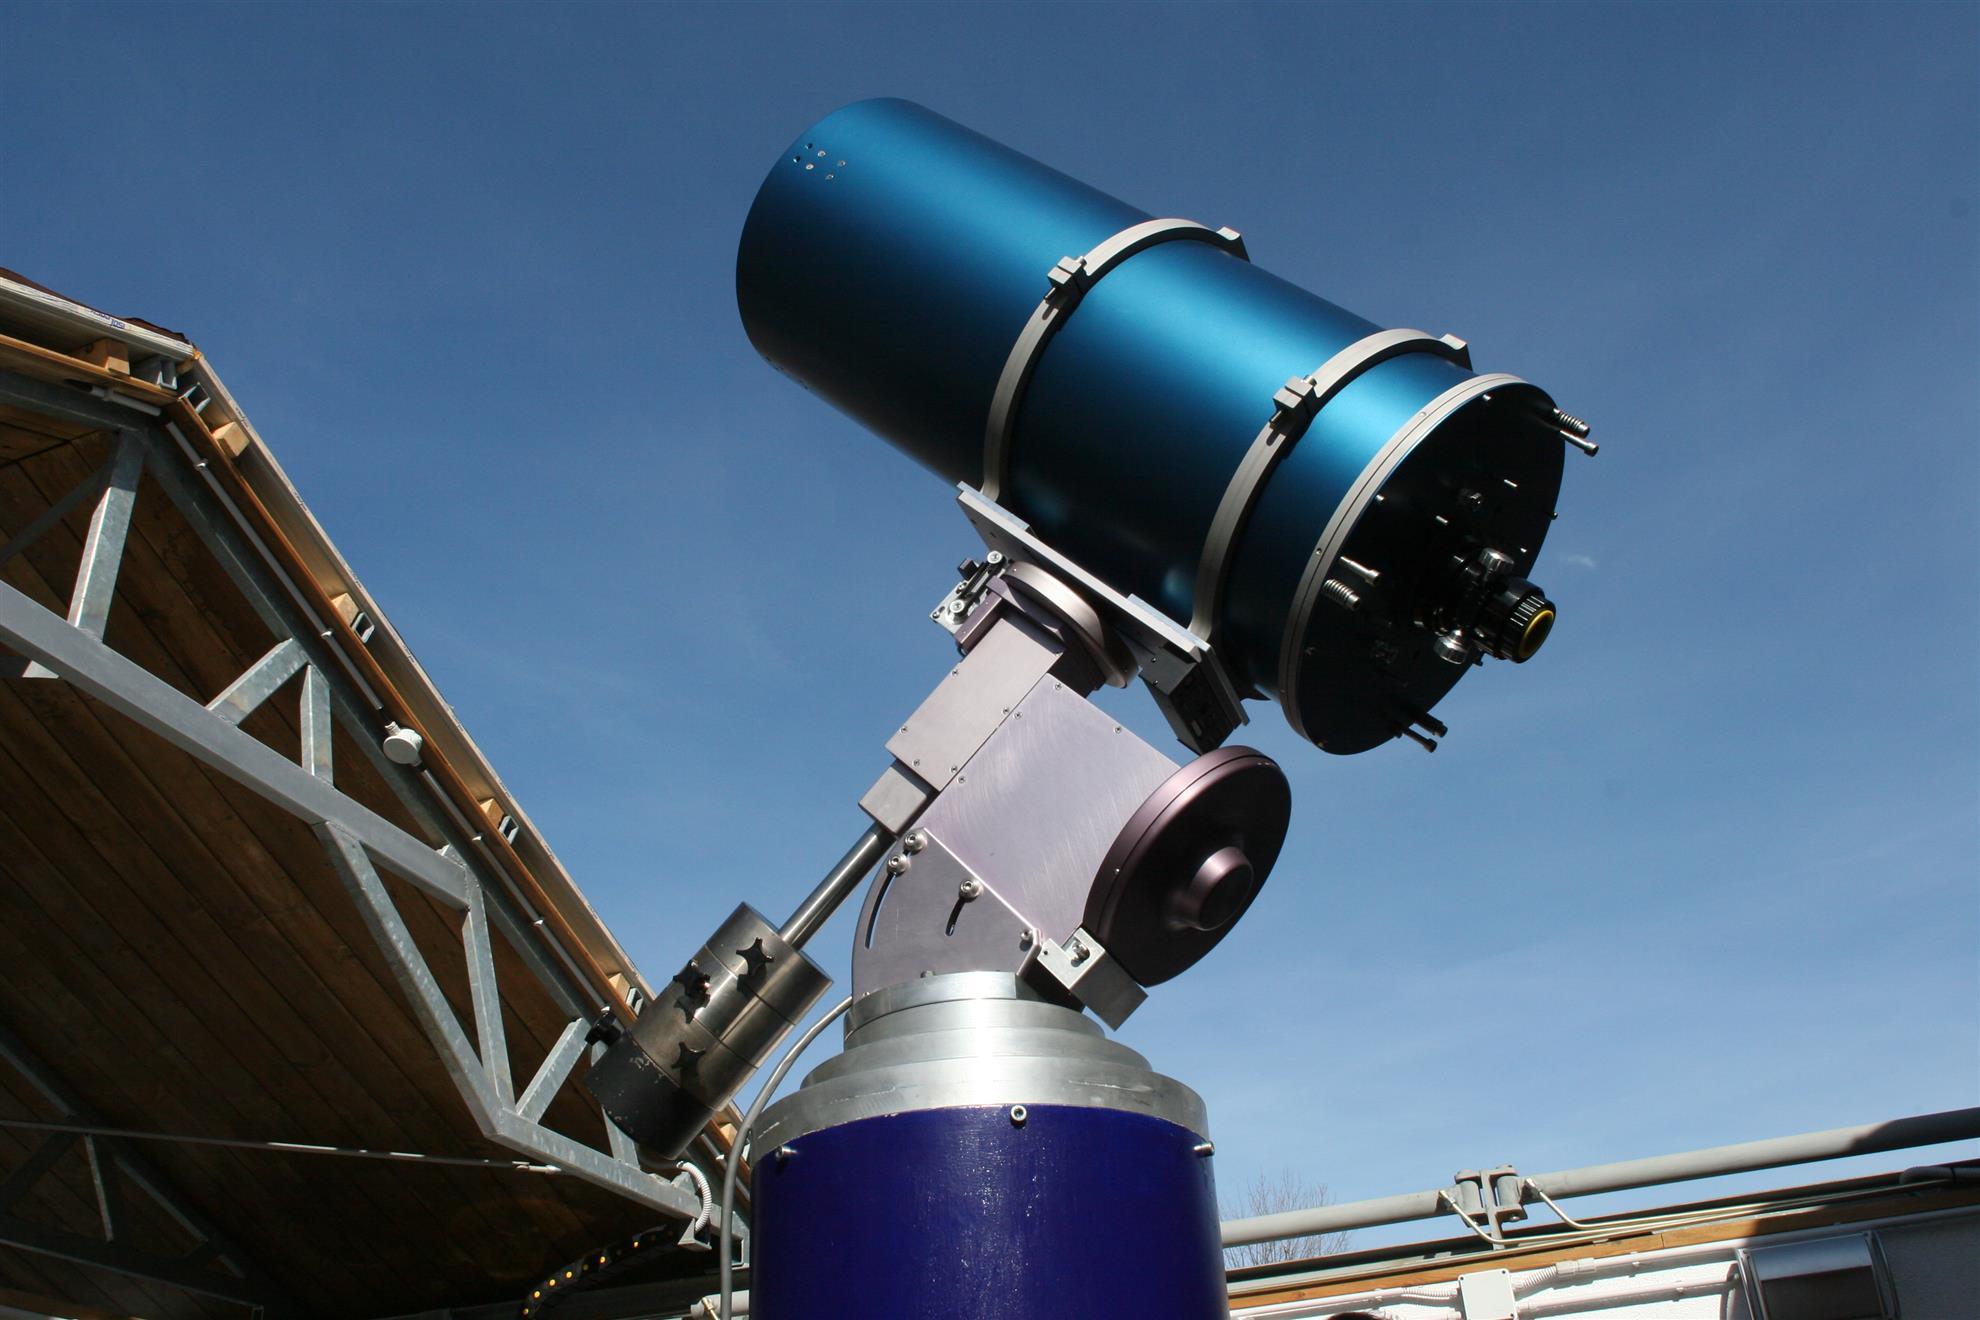 <telescopio.jpg>